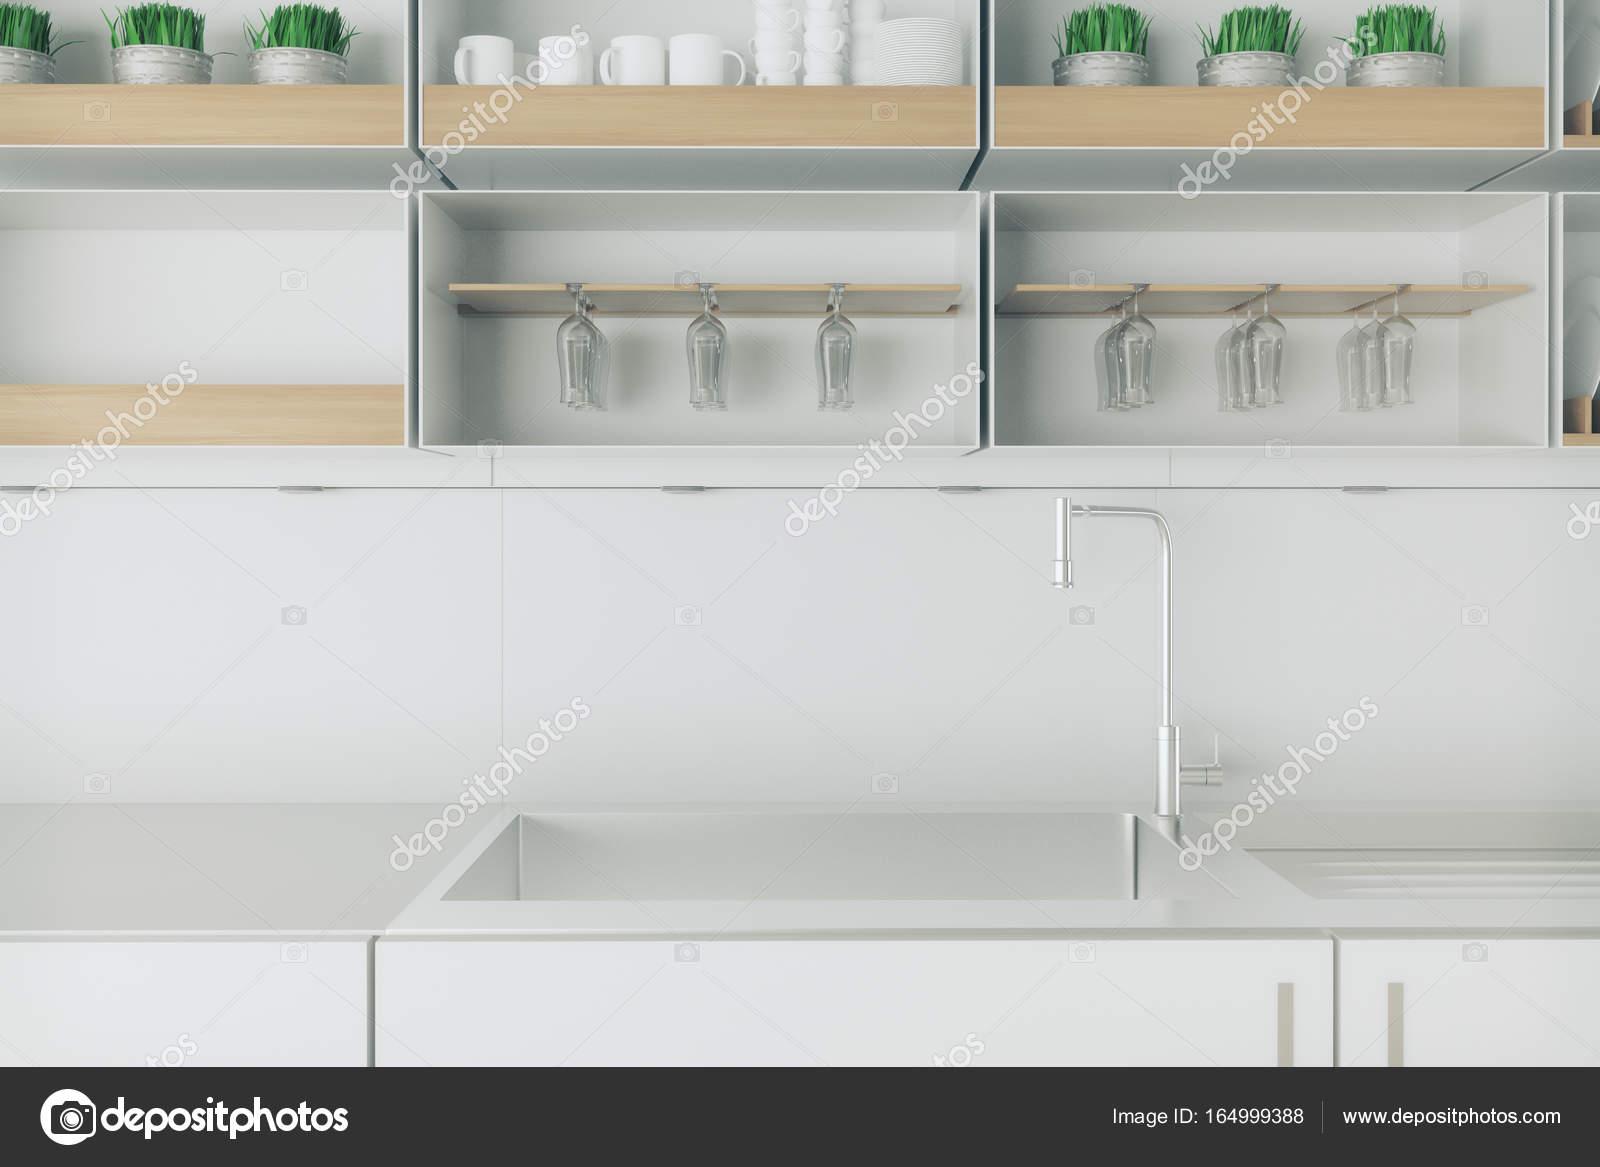 Saubere helle Küche Zähler closeup — Stockfoto © peshkov #164999388